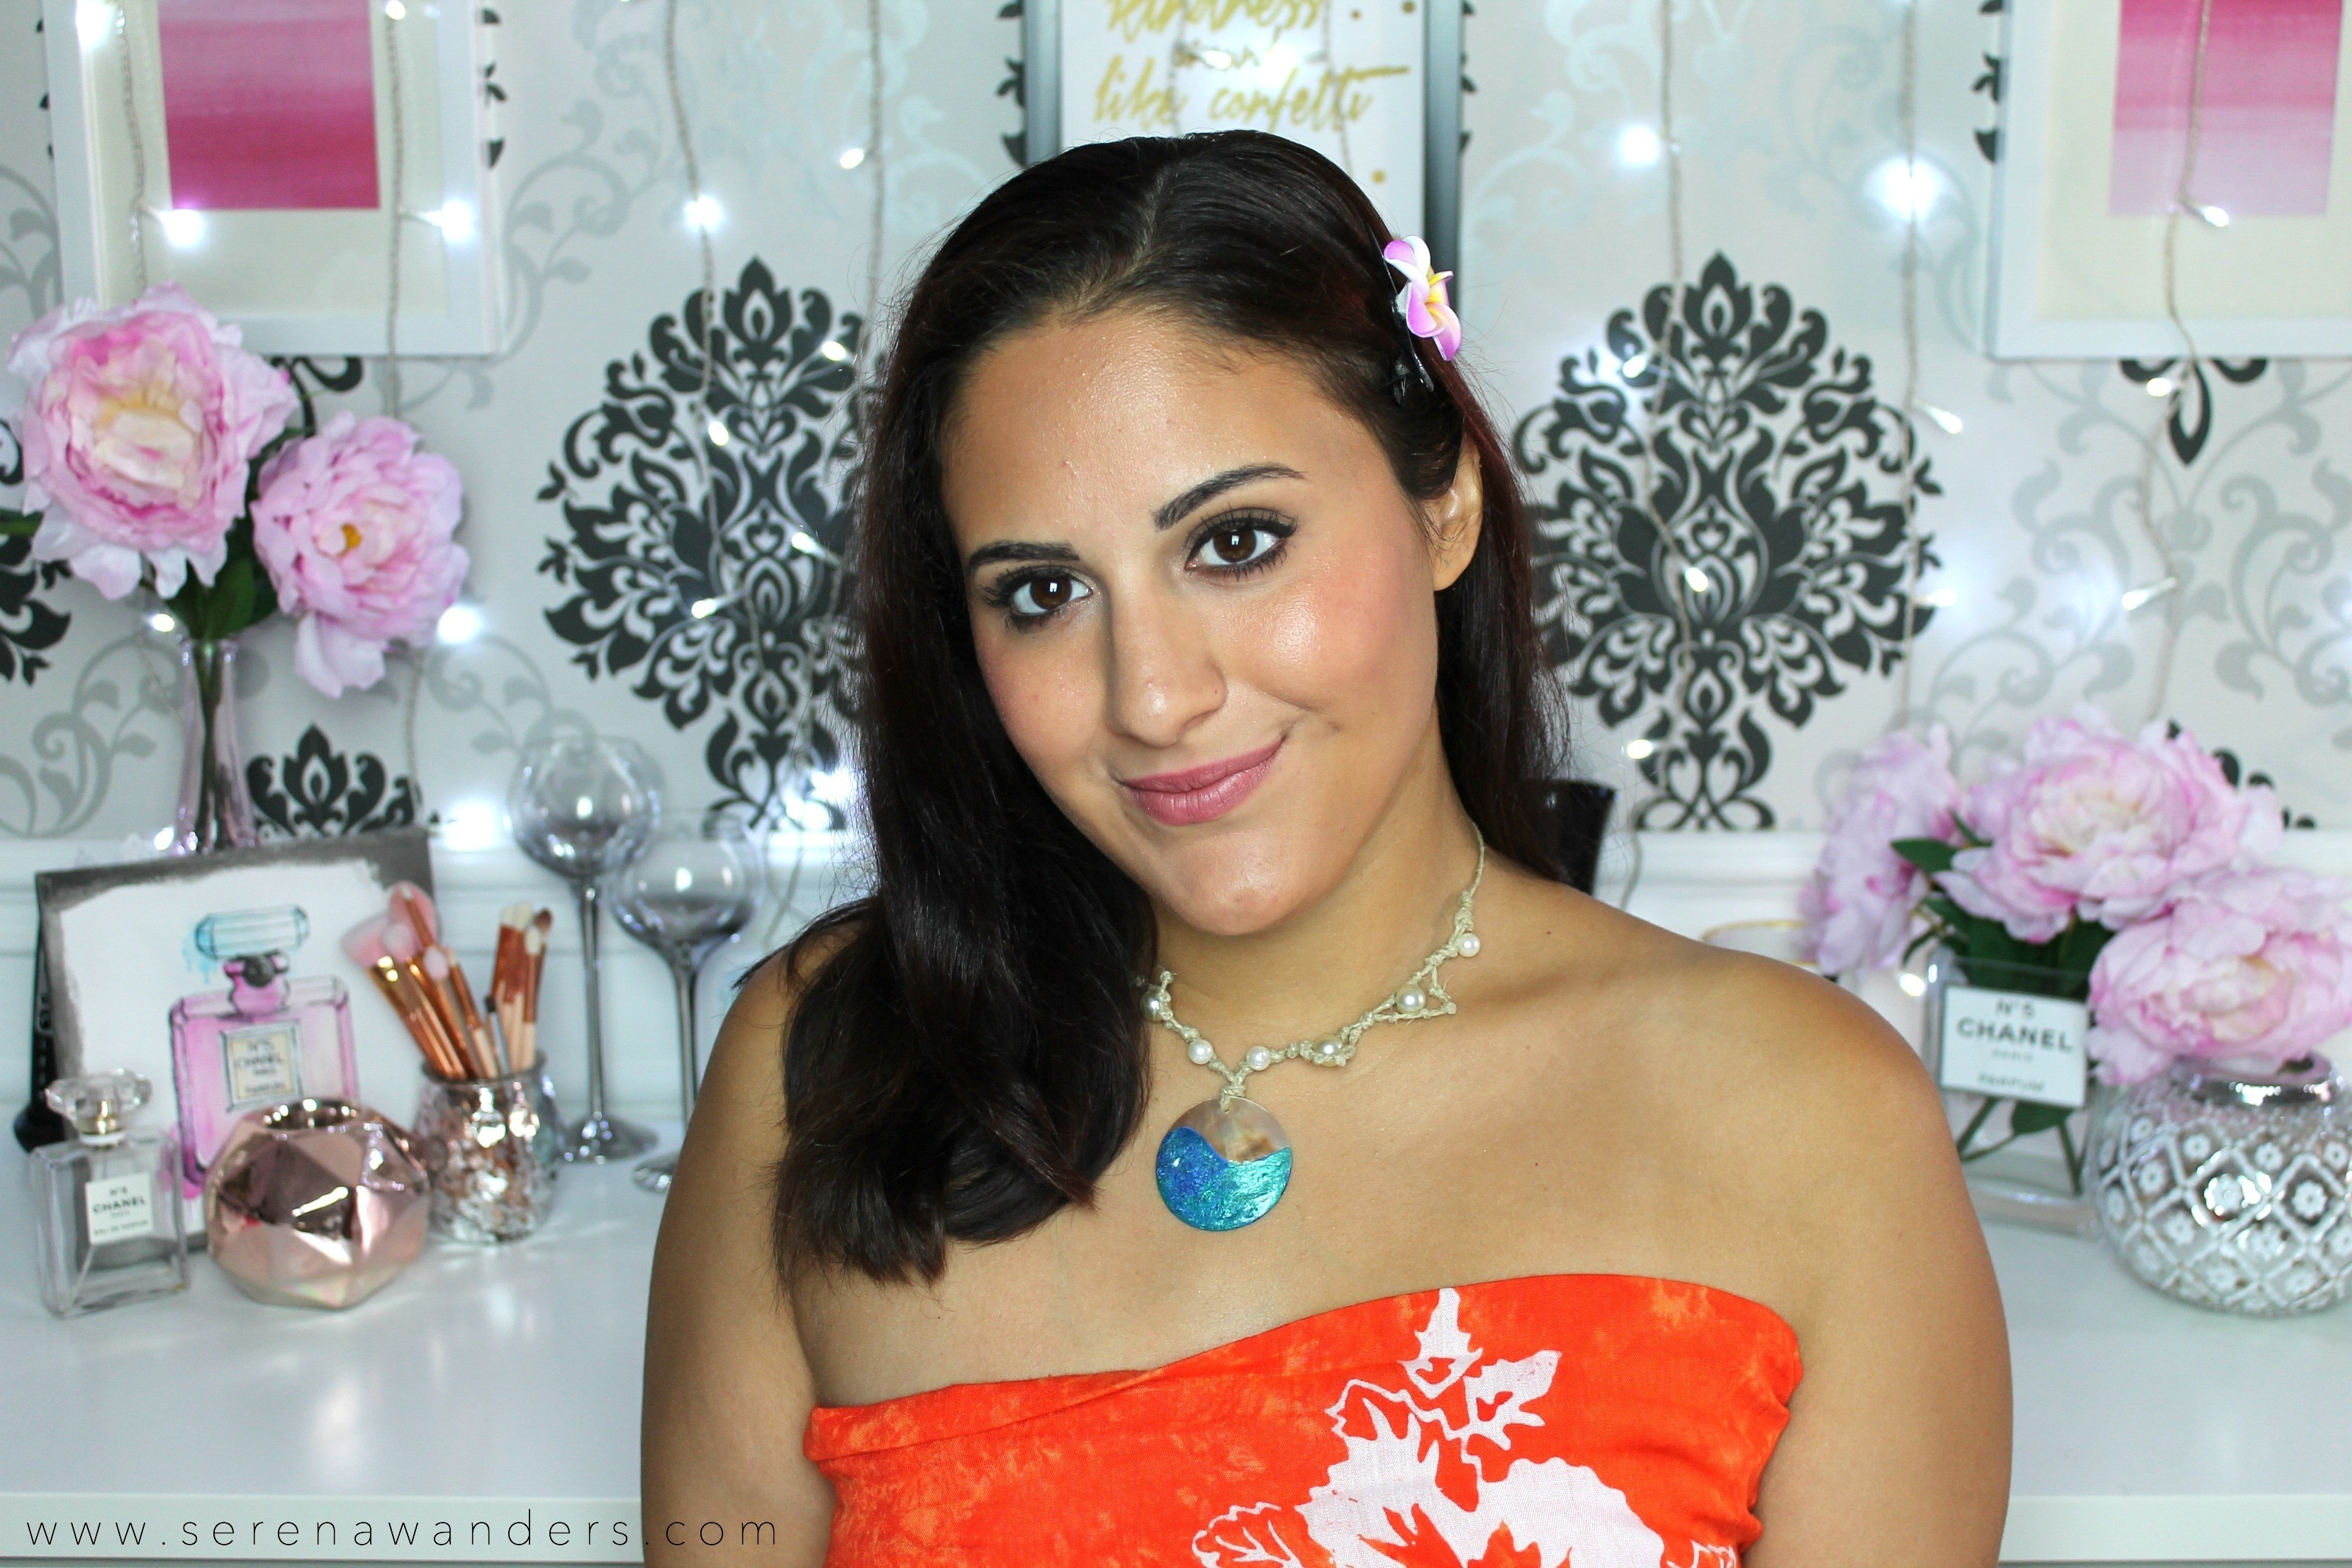 Moana vaiana disney princess makeup tutorial how to create an moana vaiana disney princess makeup tutorial how to create an eye makeup look beauty on cut out keep baditri Choice Image